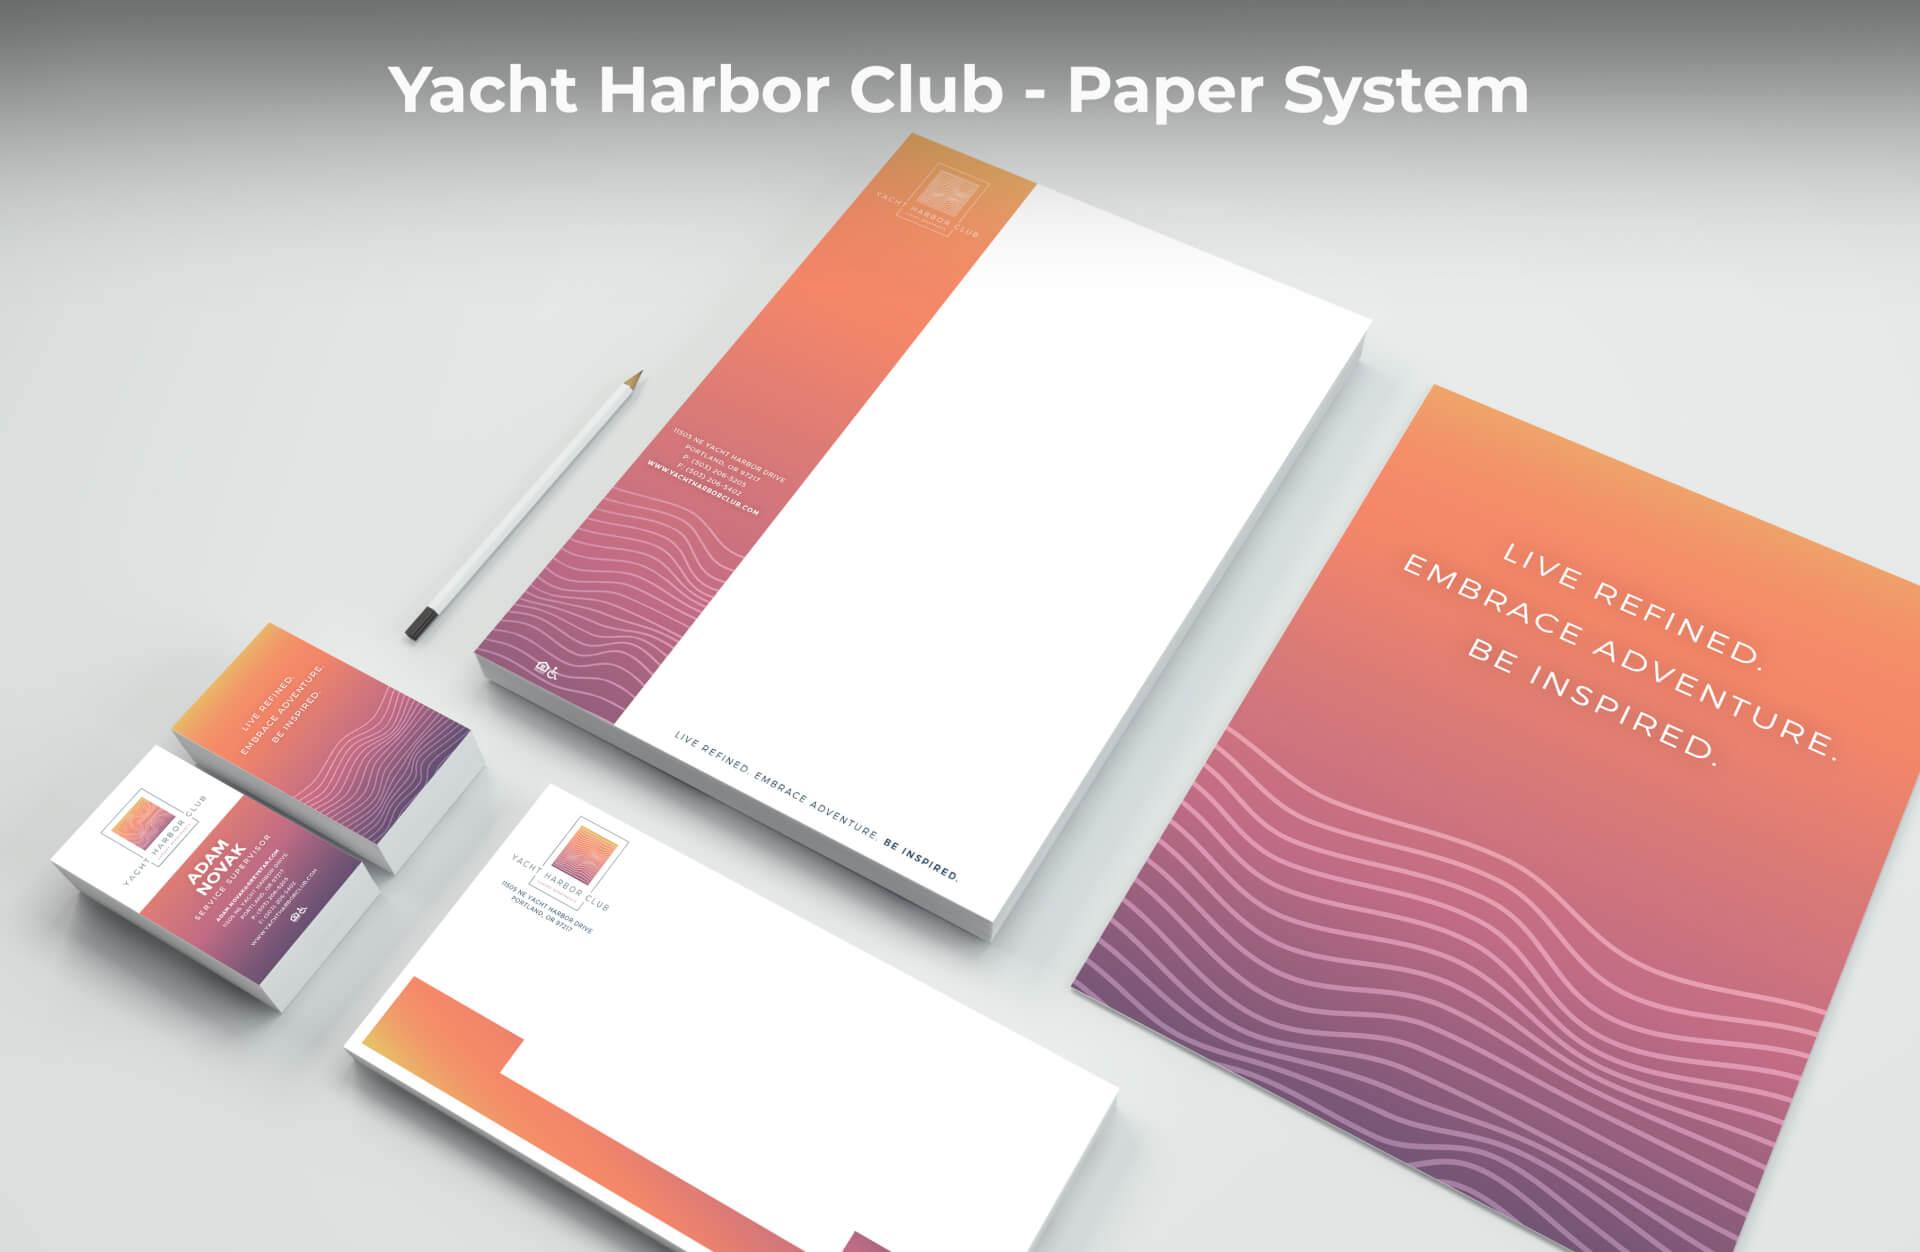 YHC Paper System